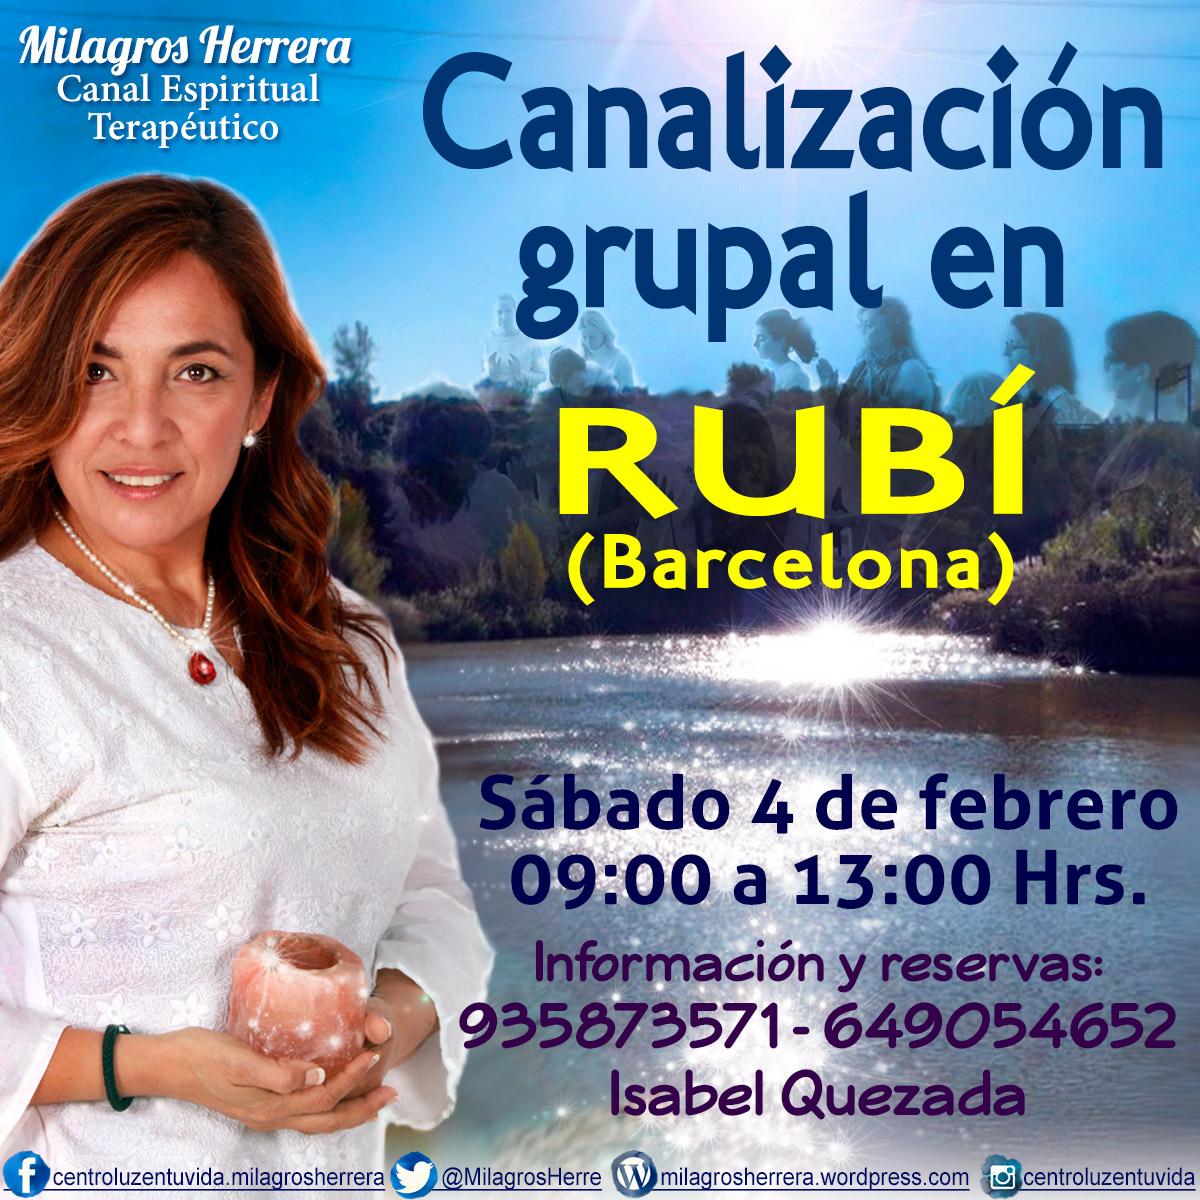 Milagros Herrera, Canal Espiritual